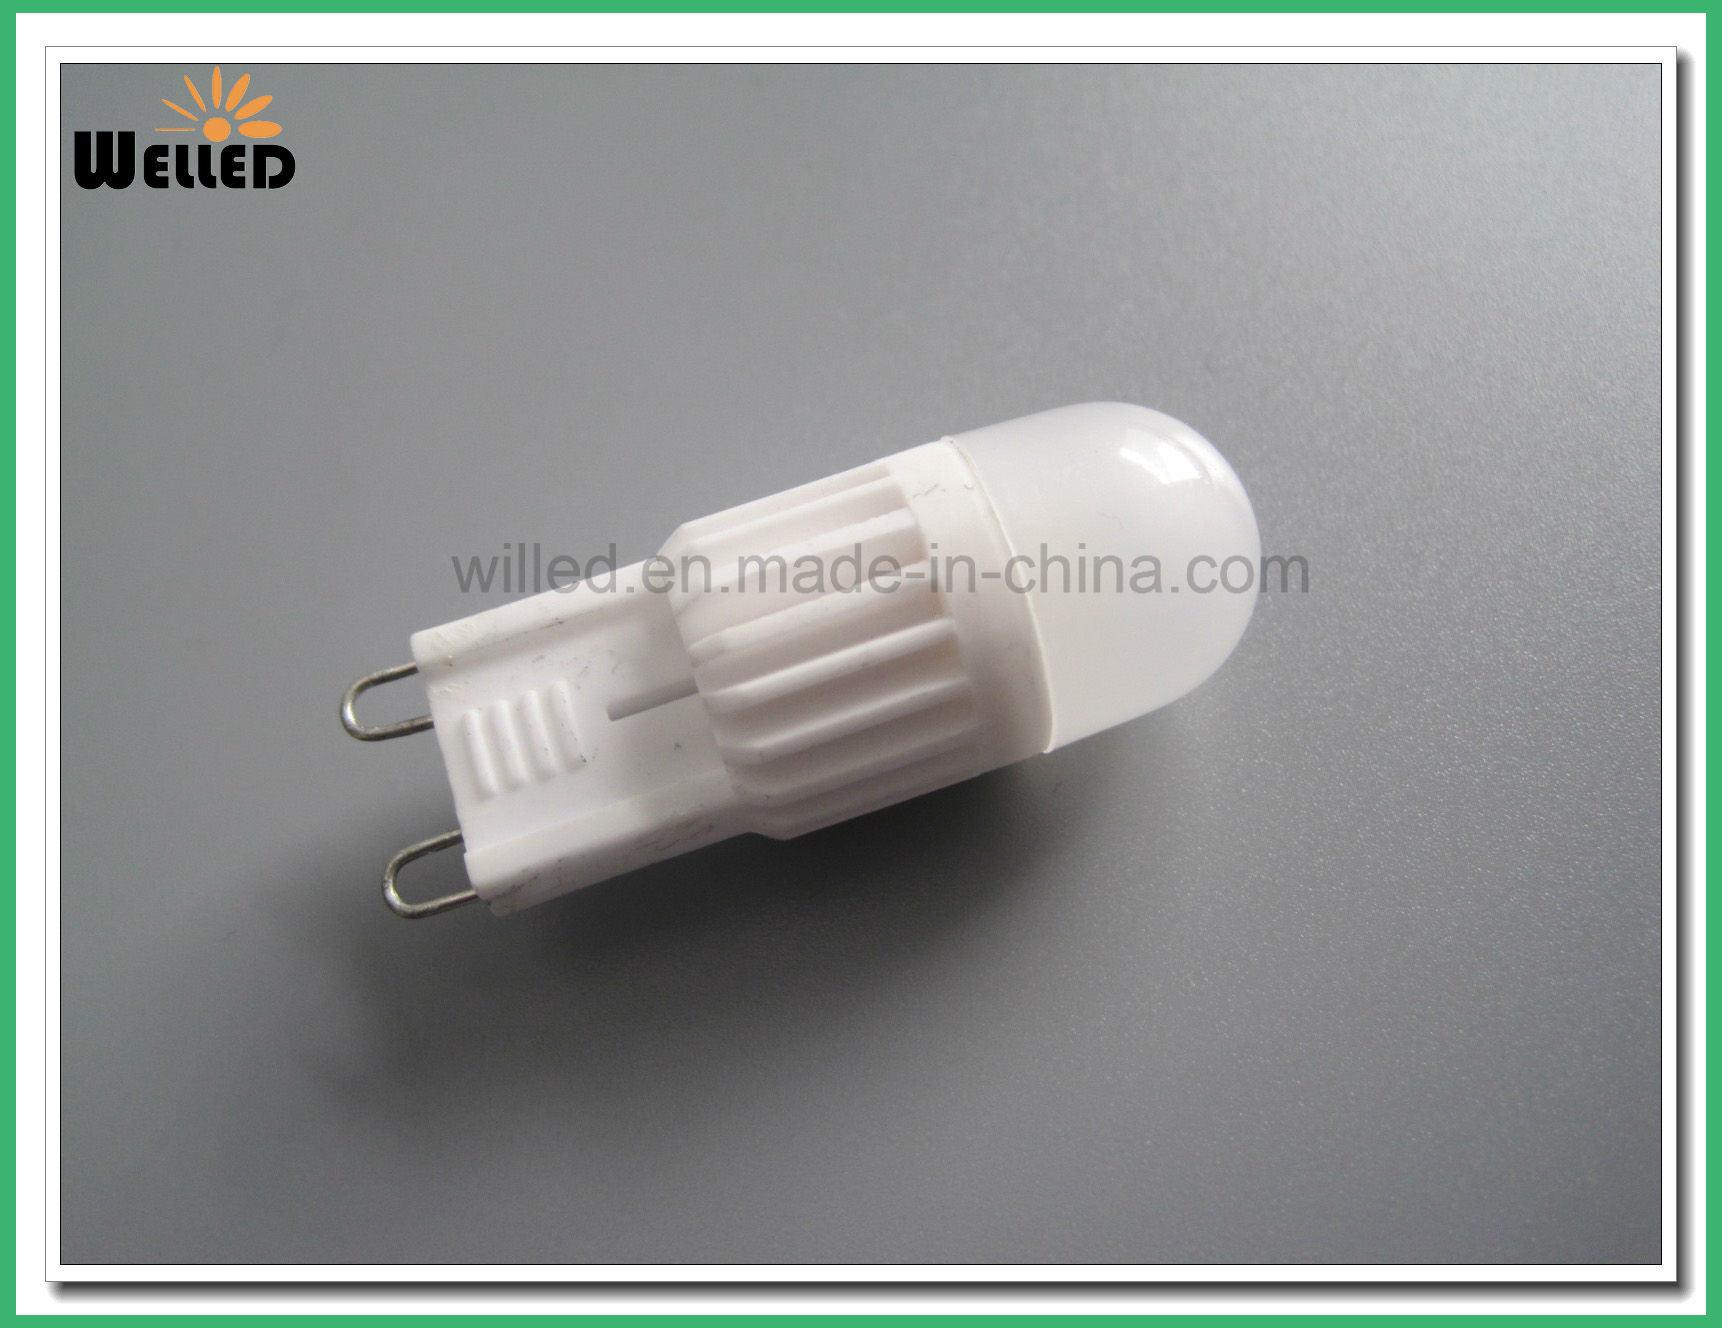 Decorative G4 Ceramic PC LED Light Lamp 2W Dcac12V for Car Light